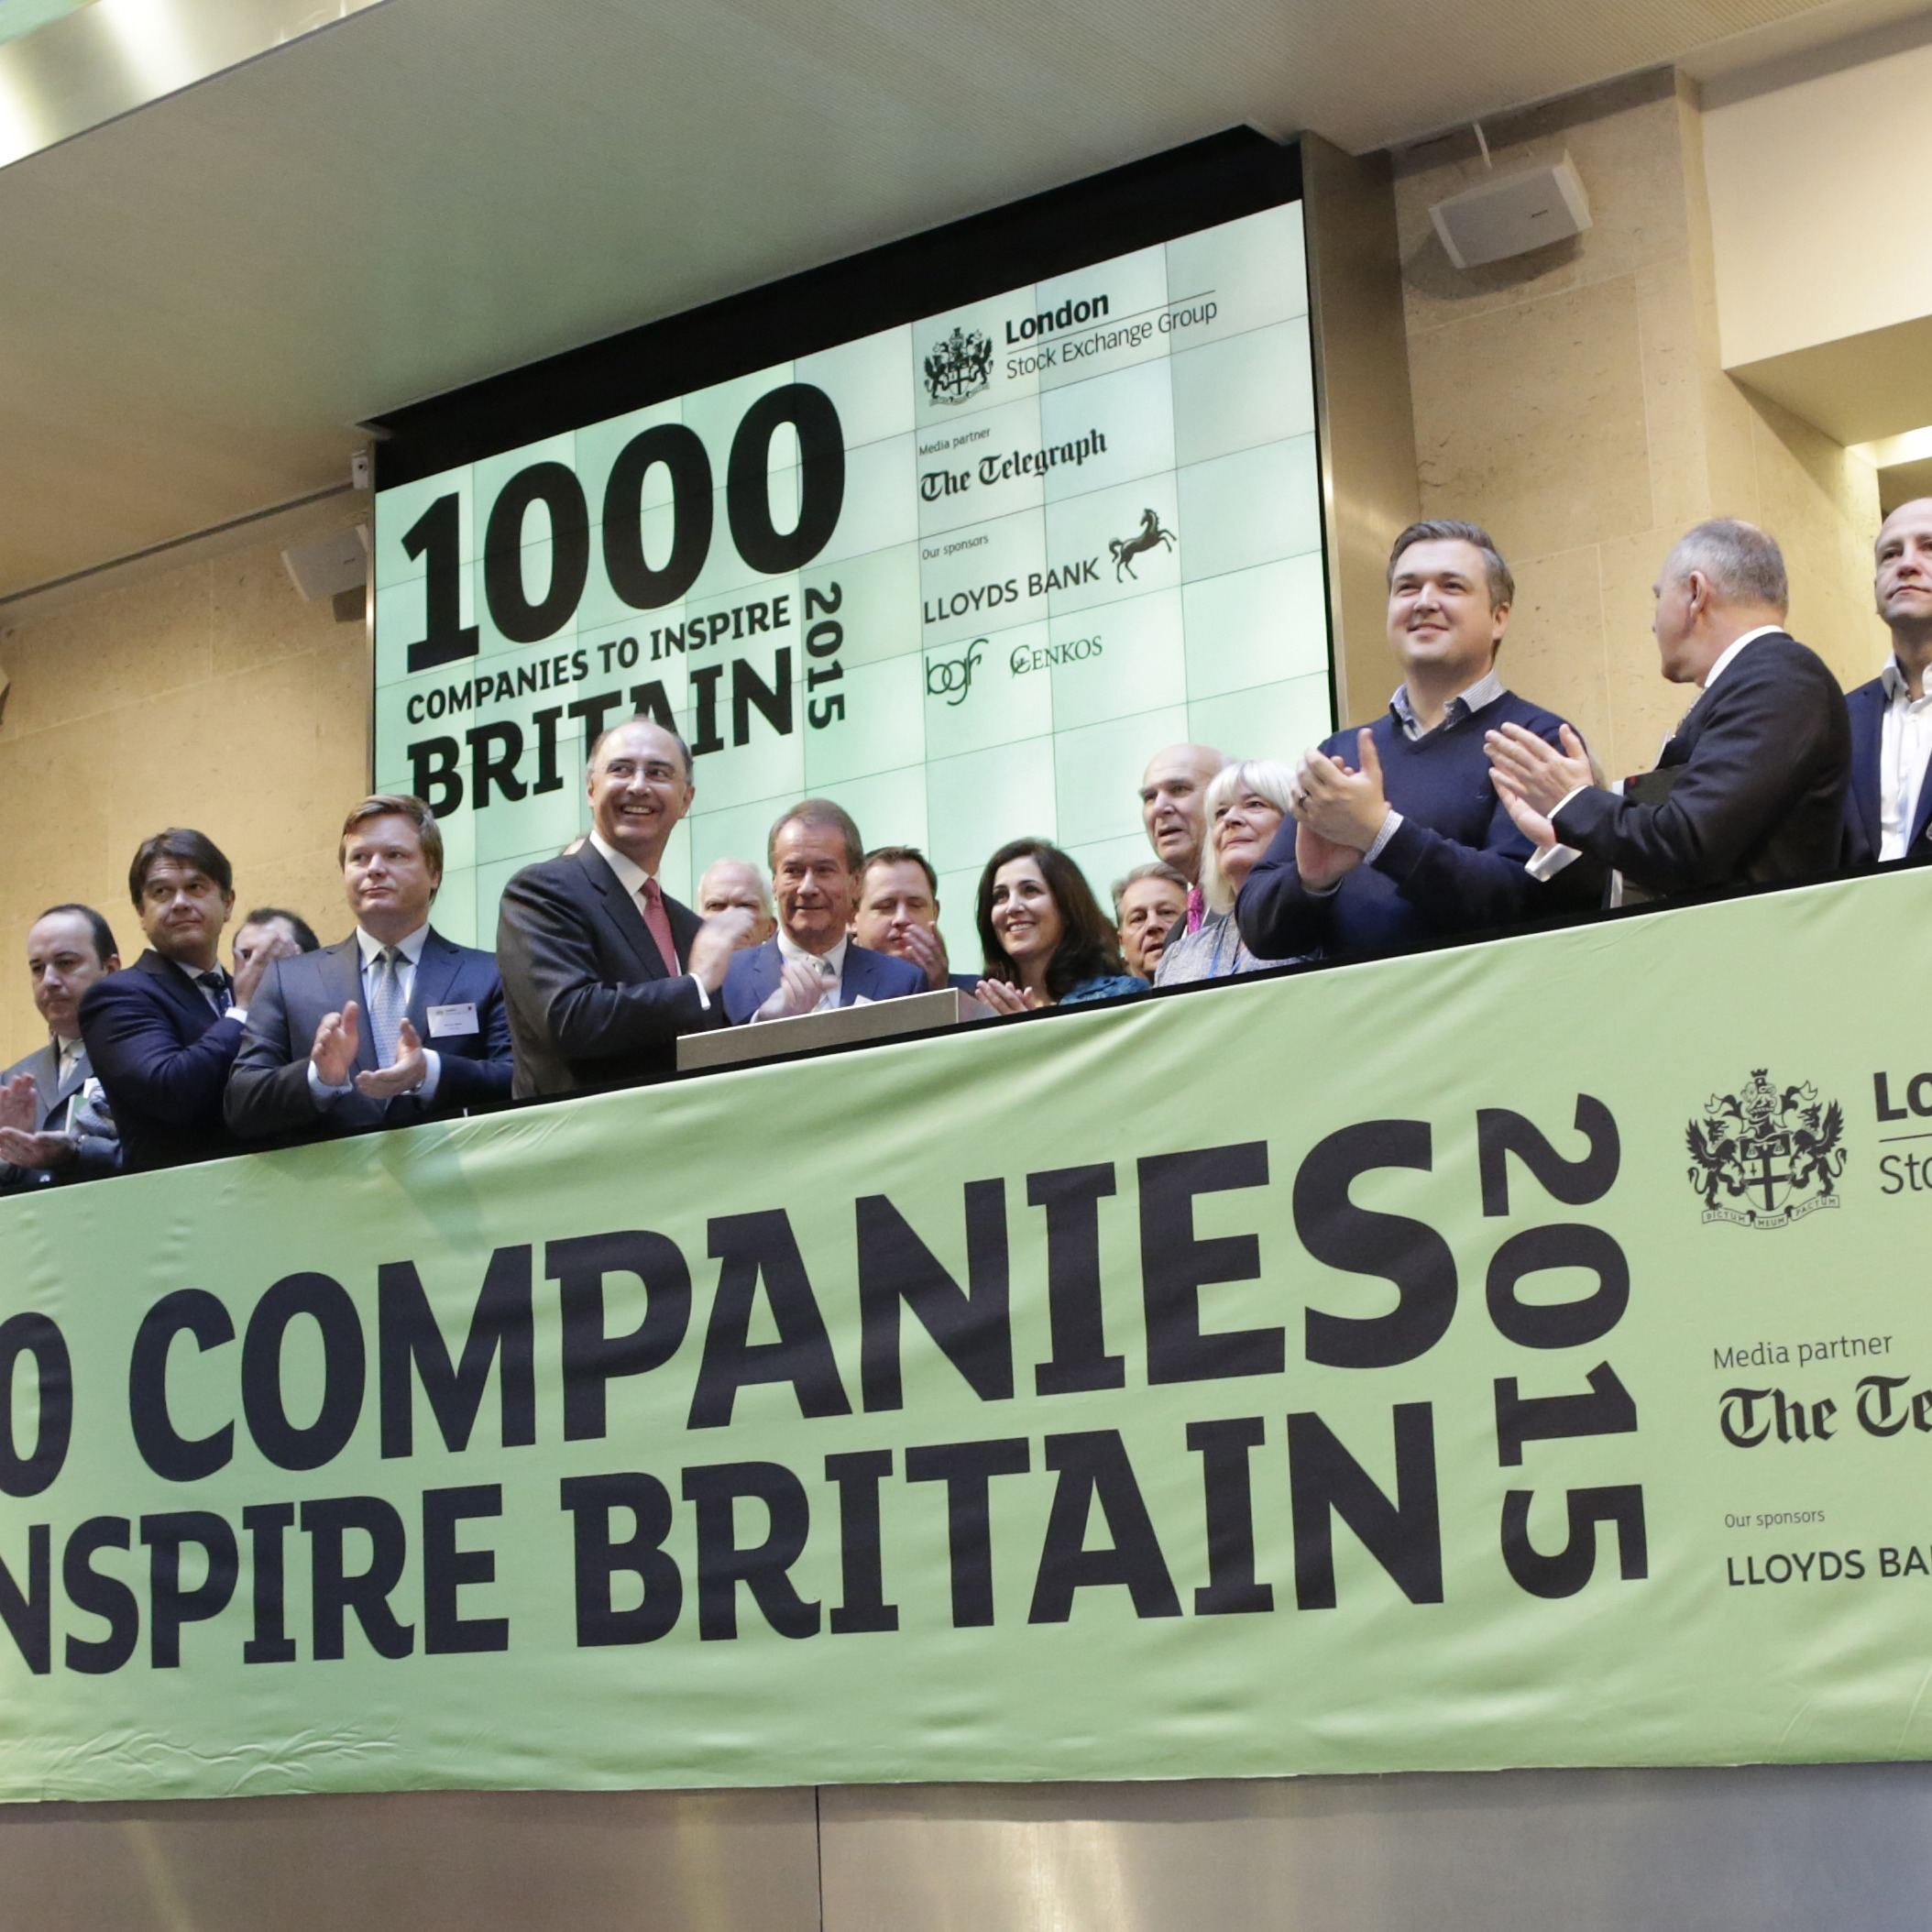 1000-Companies-to-Inspire-Britain